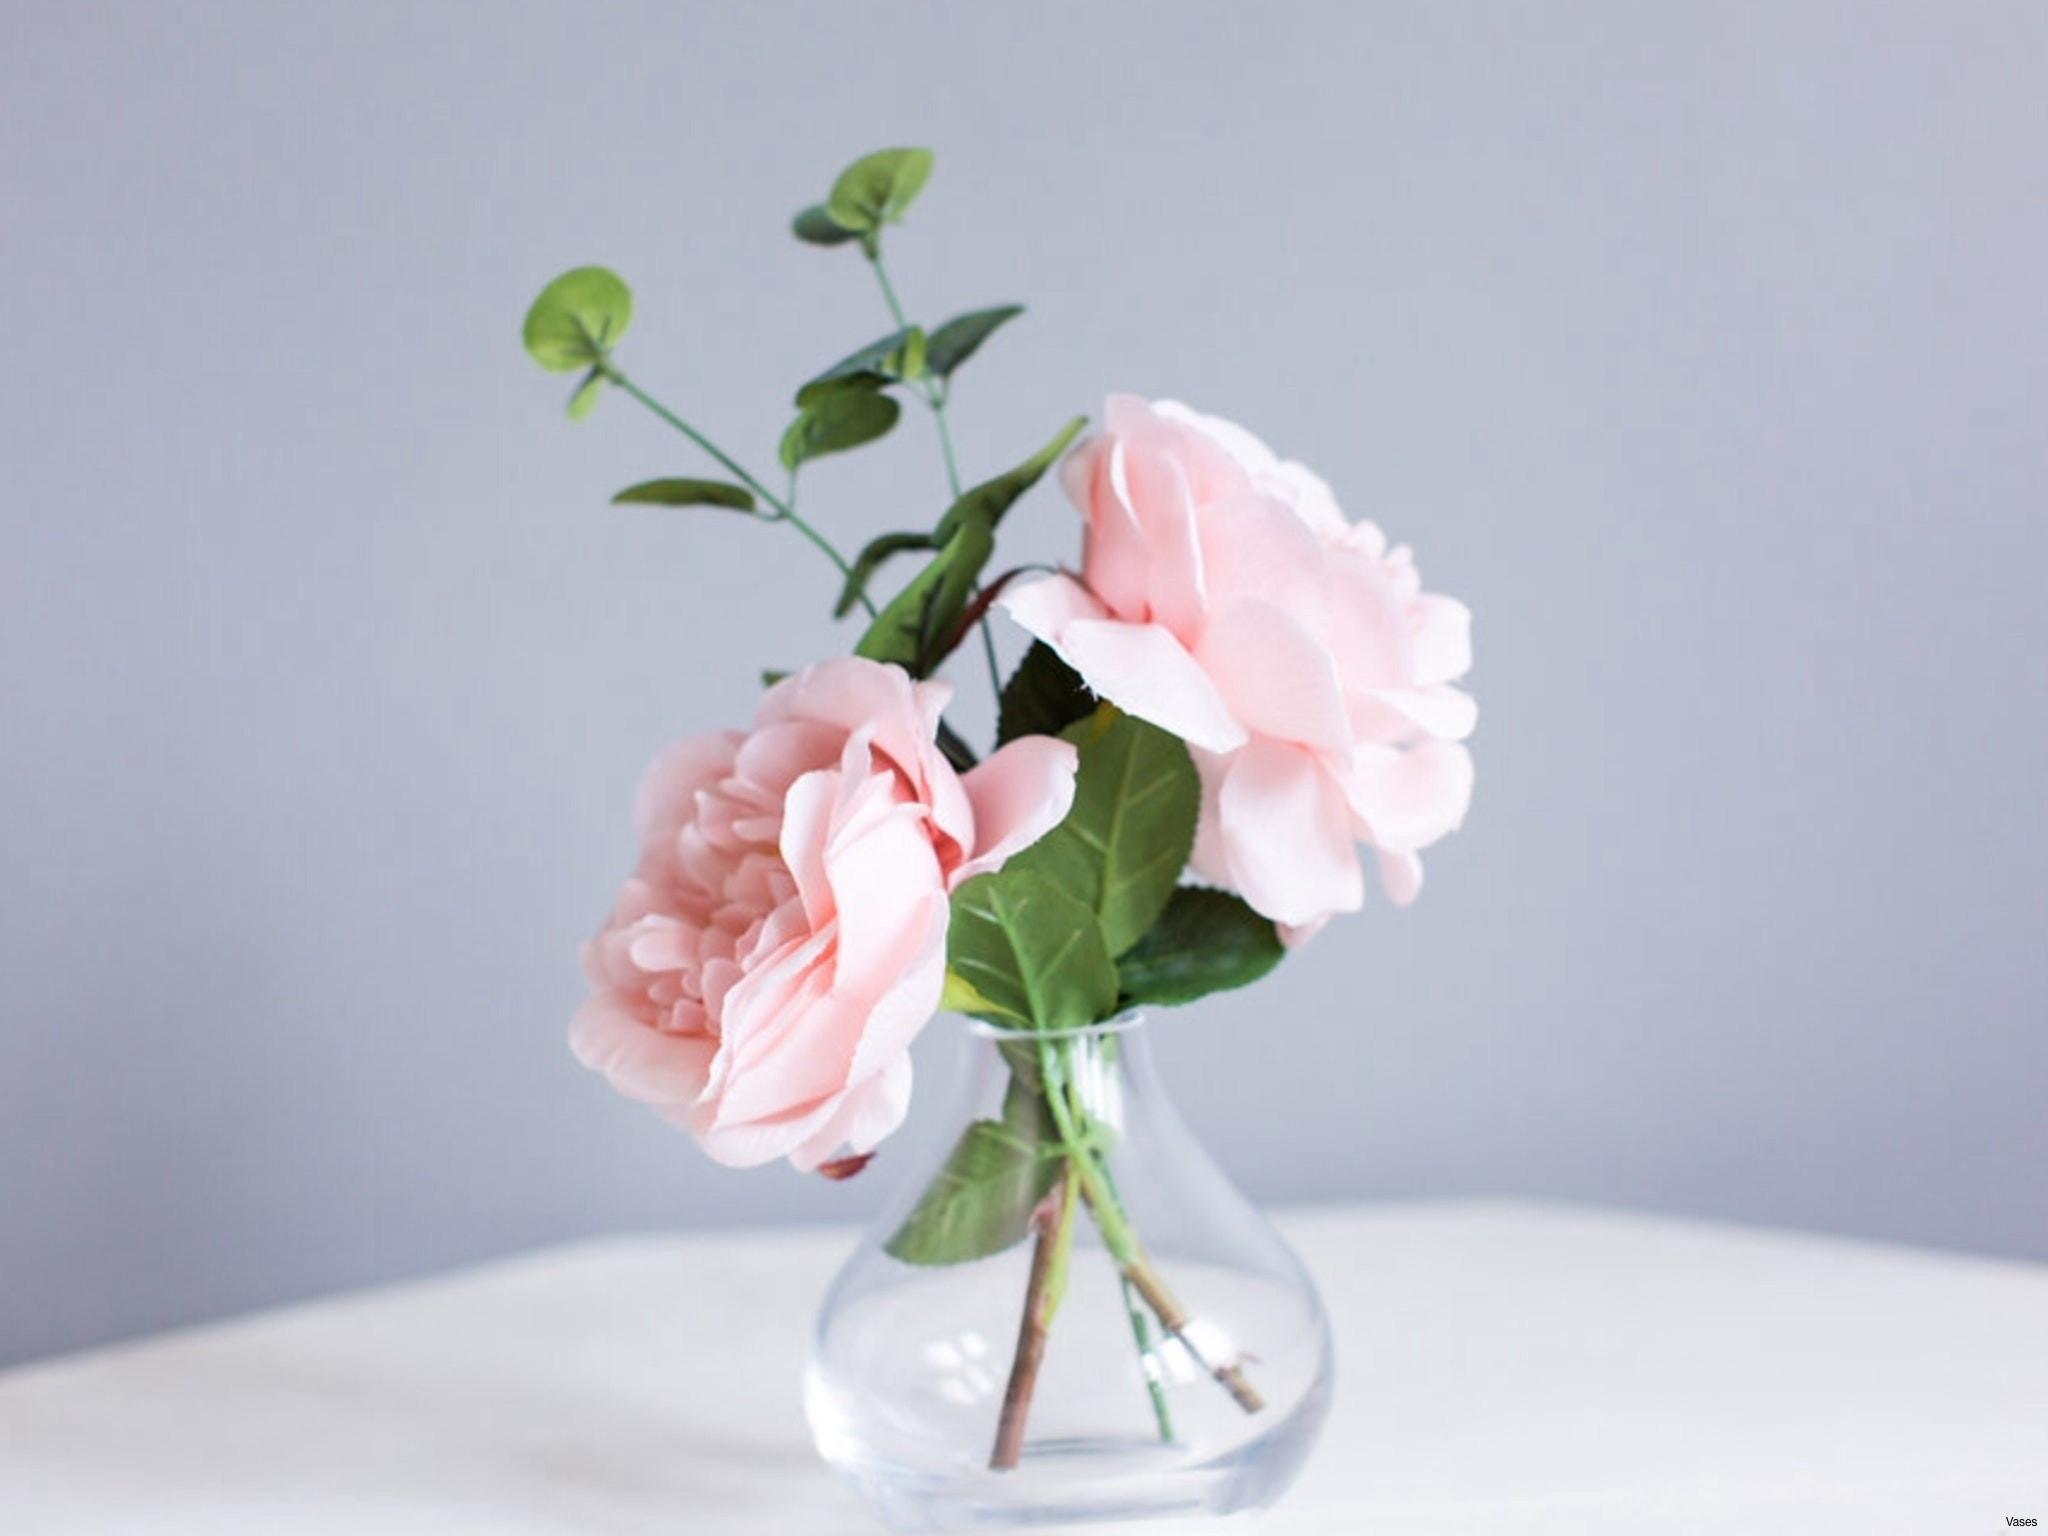 stay in the vase cemetery flowers of 10 fresh black marble vase bogekompresorturkiye com within h vases bud vase flower arrangements i 0d for inspiration design design vases with flowers